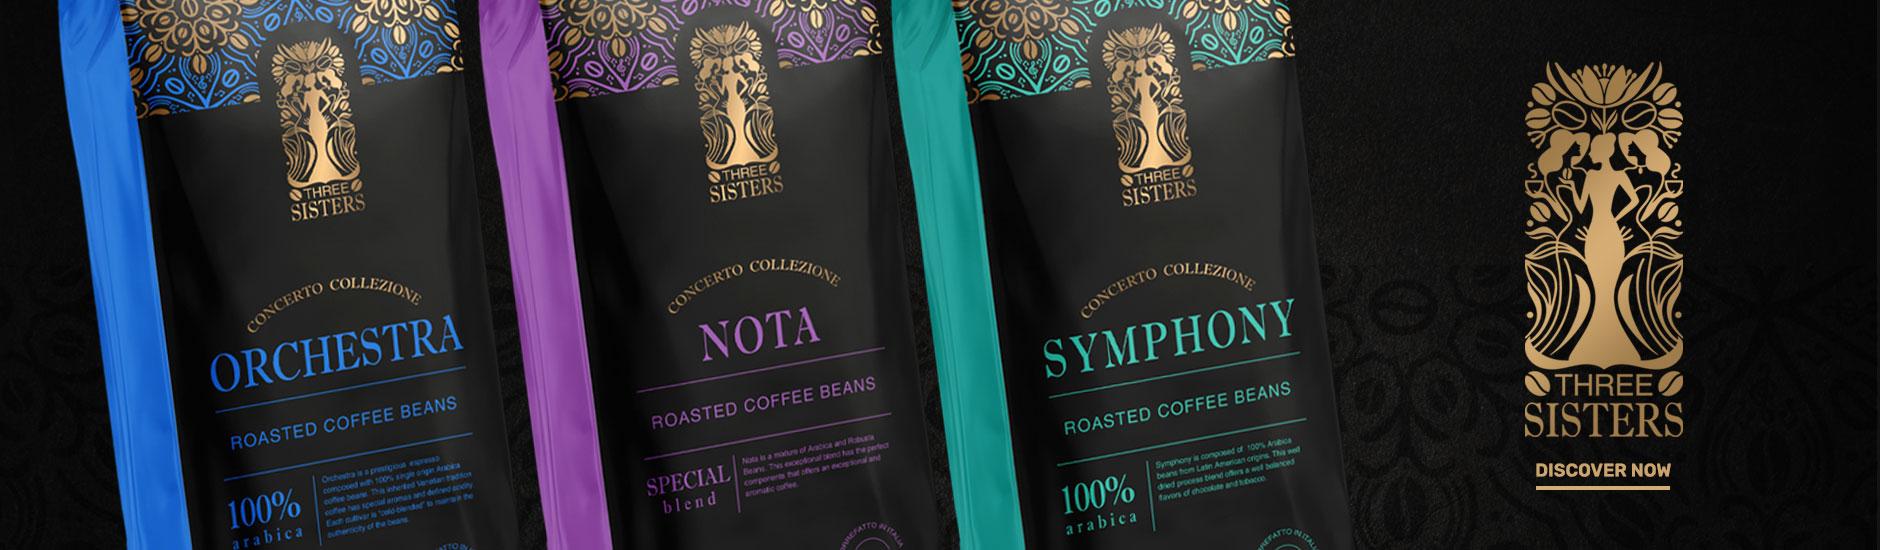 Three Sisters Premium Coffee